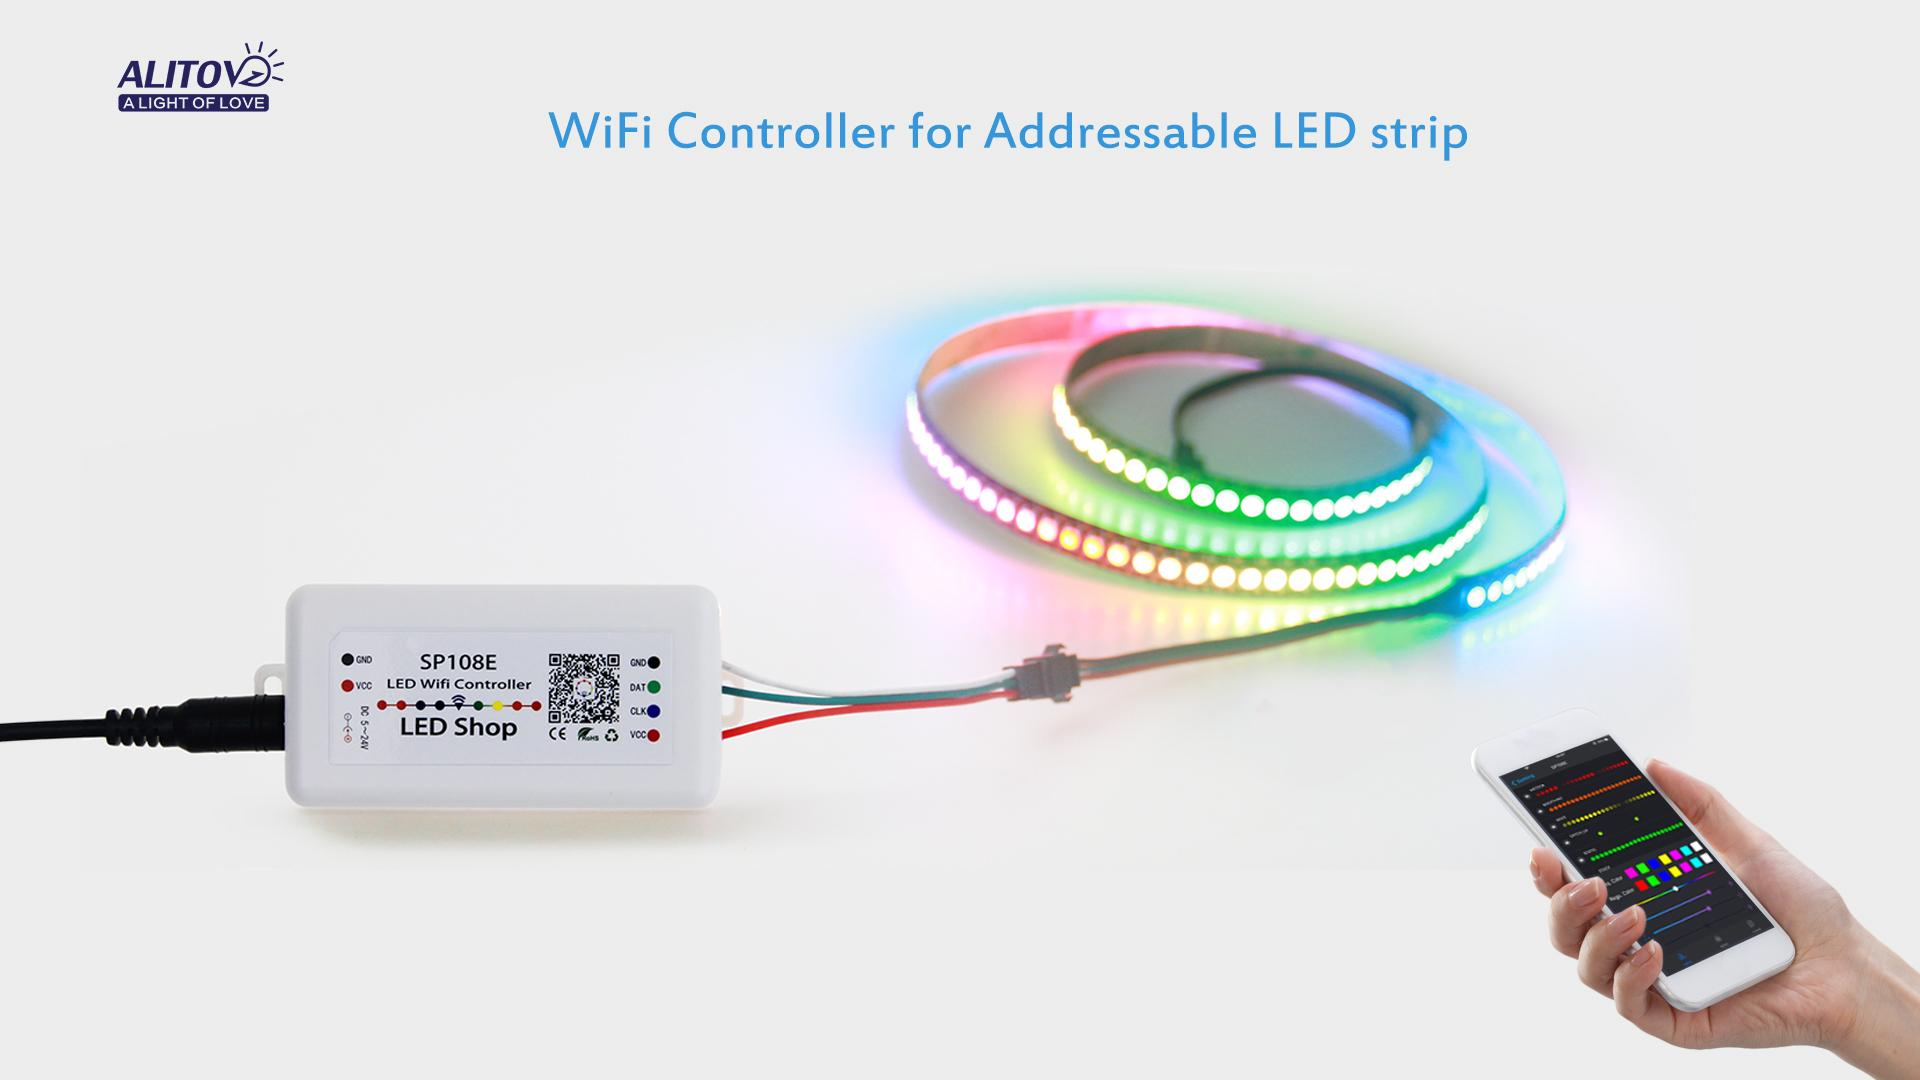 ALITOVE WS2812B WS2811 WS2801 LED WiFi Controller, iOS